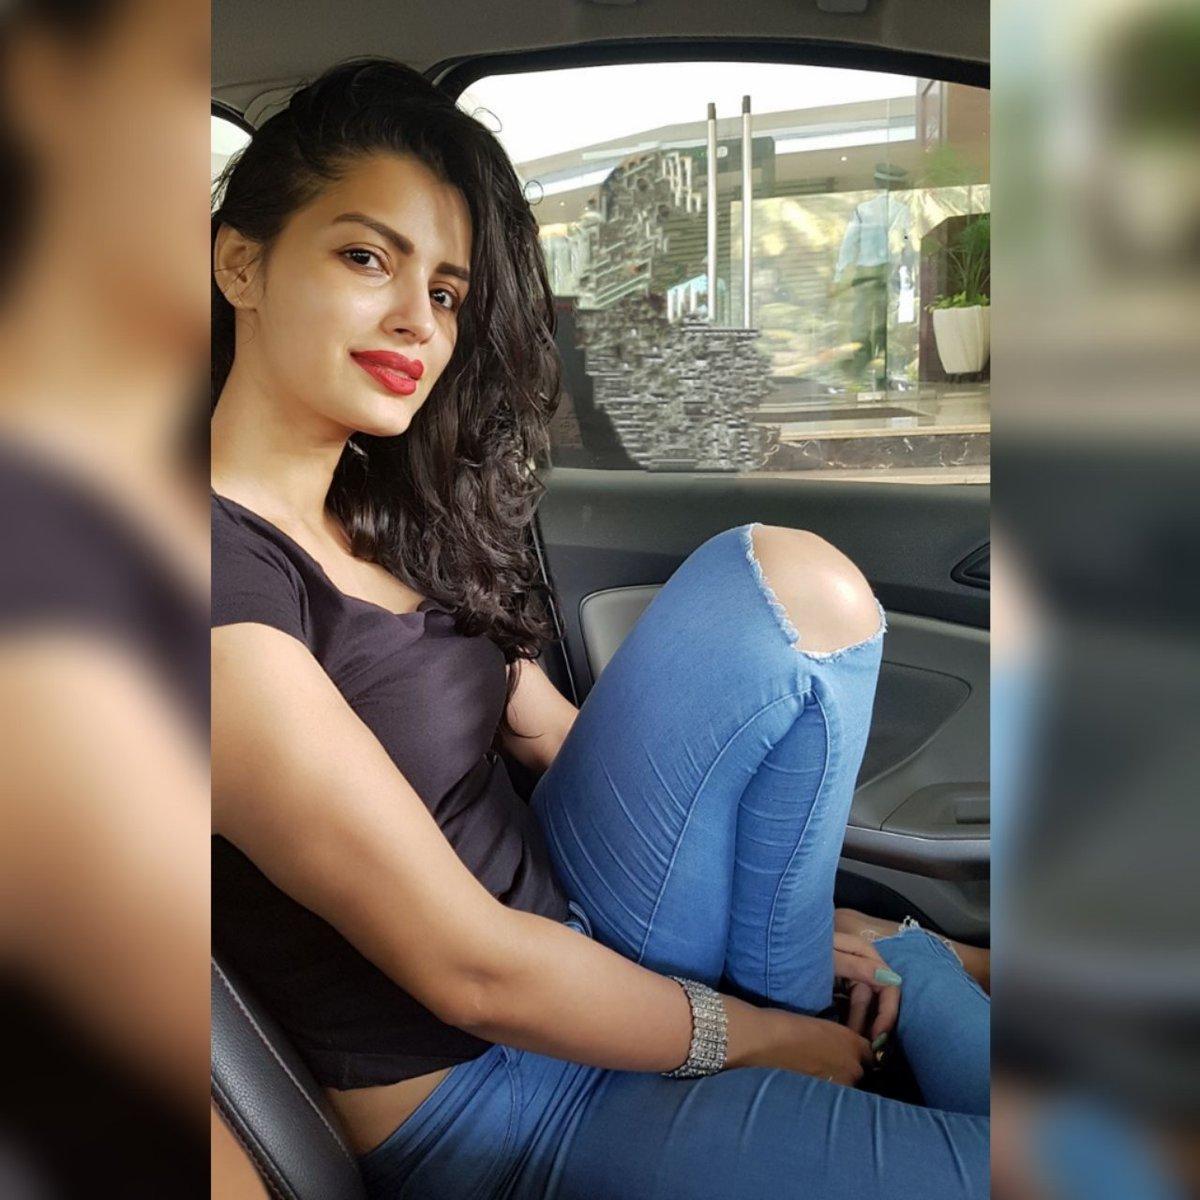 Sonali Raut nudes (27 photo), Sexy, Fappening, Feet, braless 2018